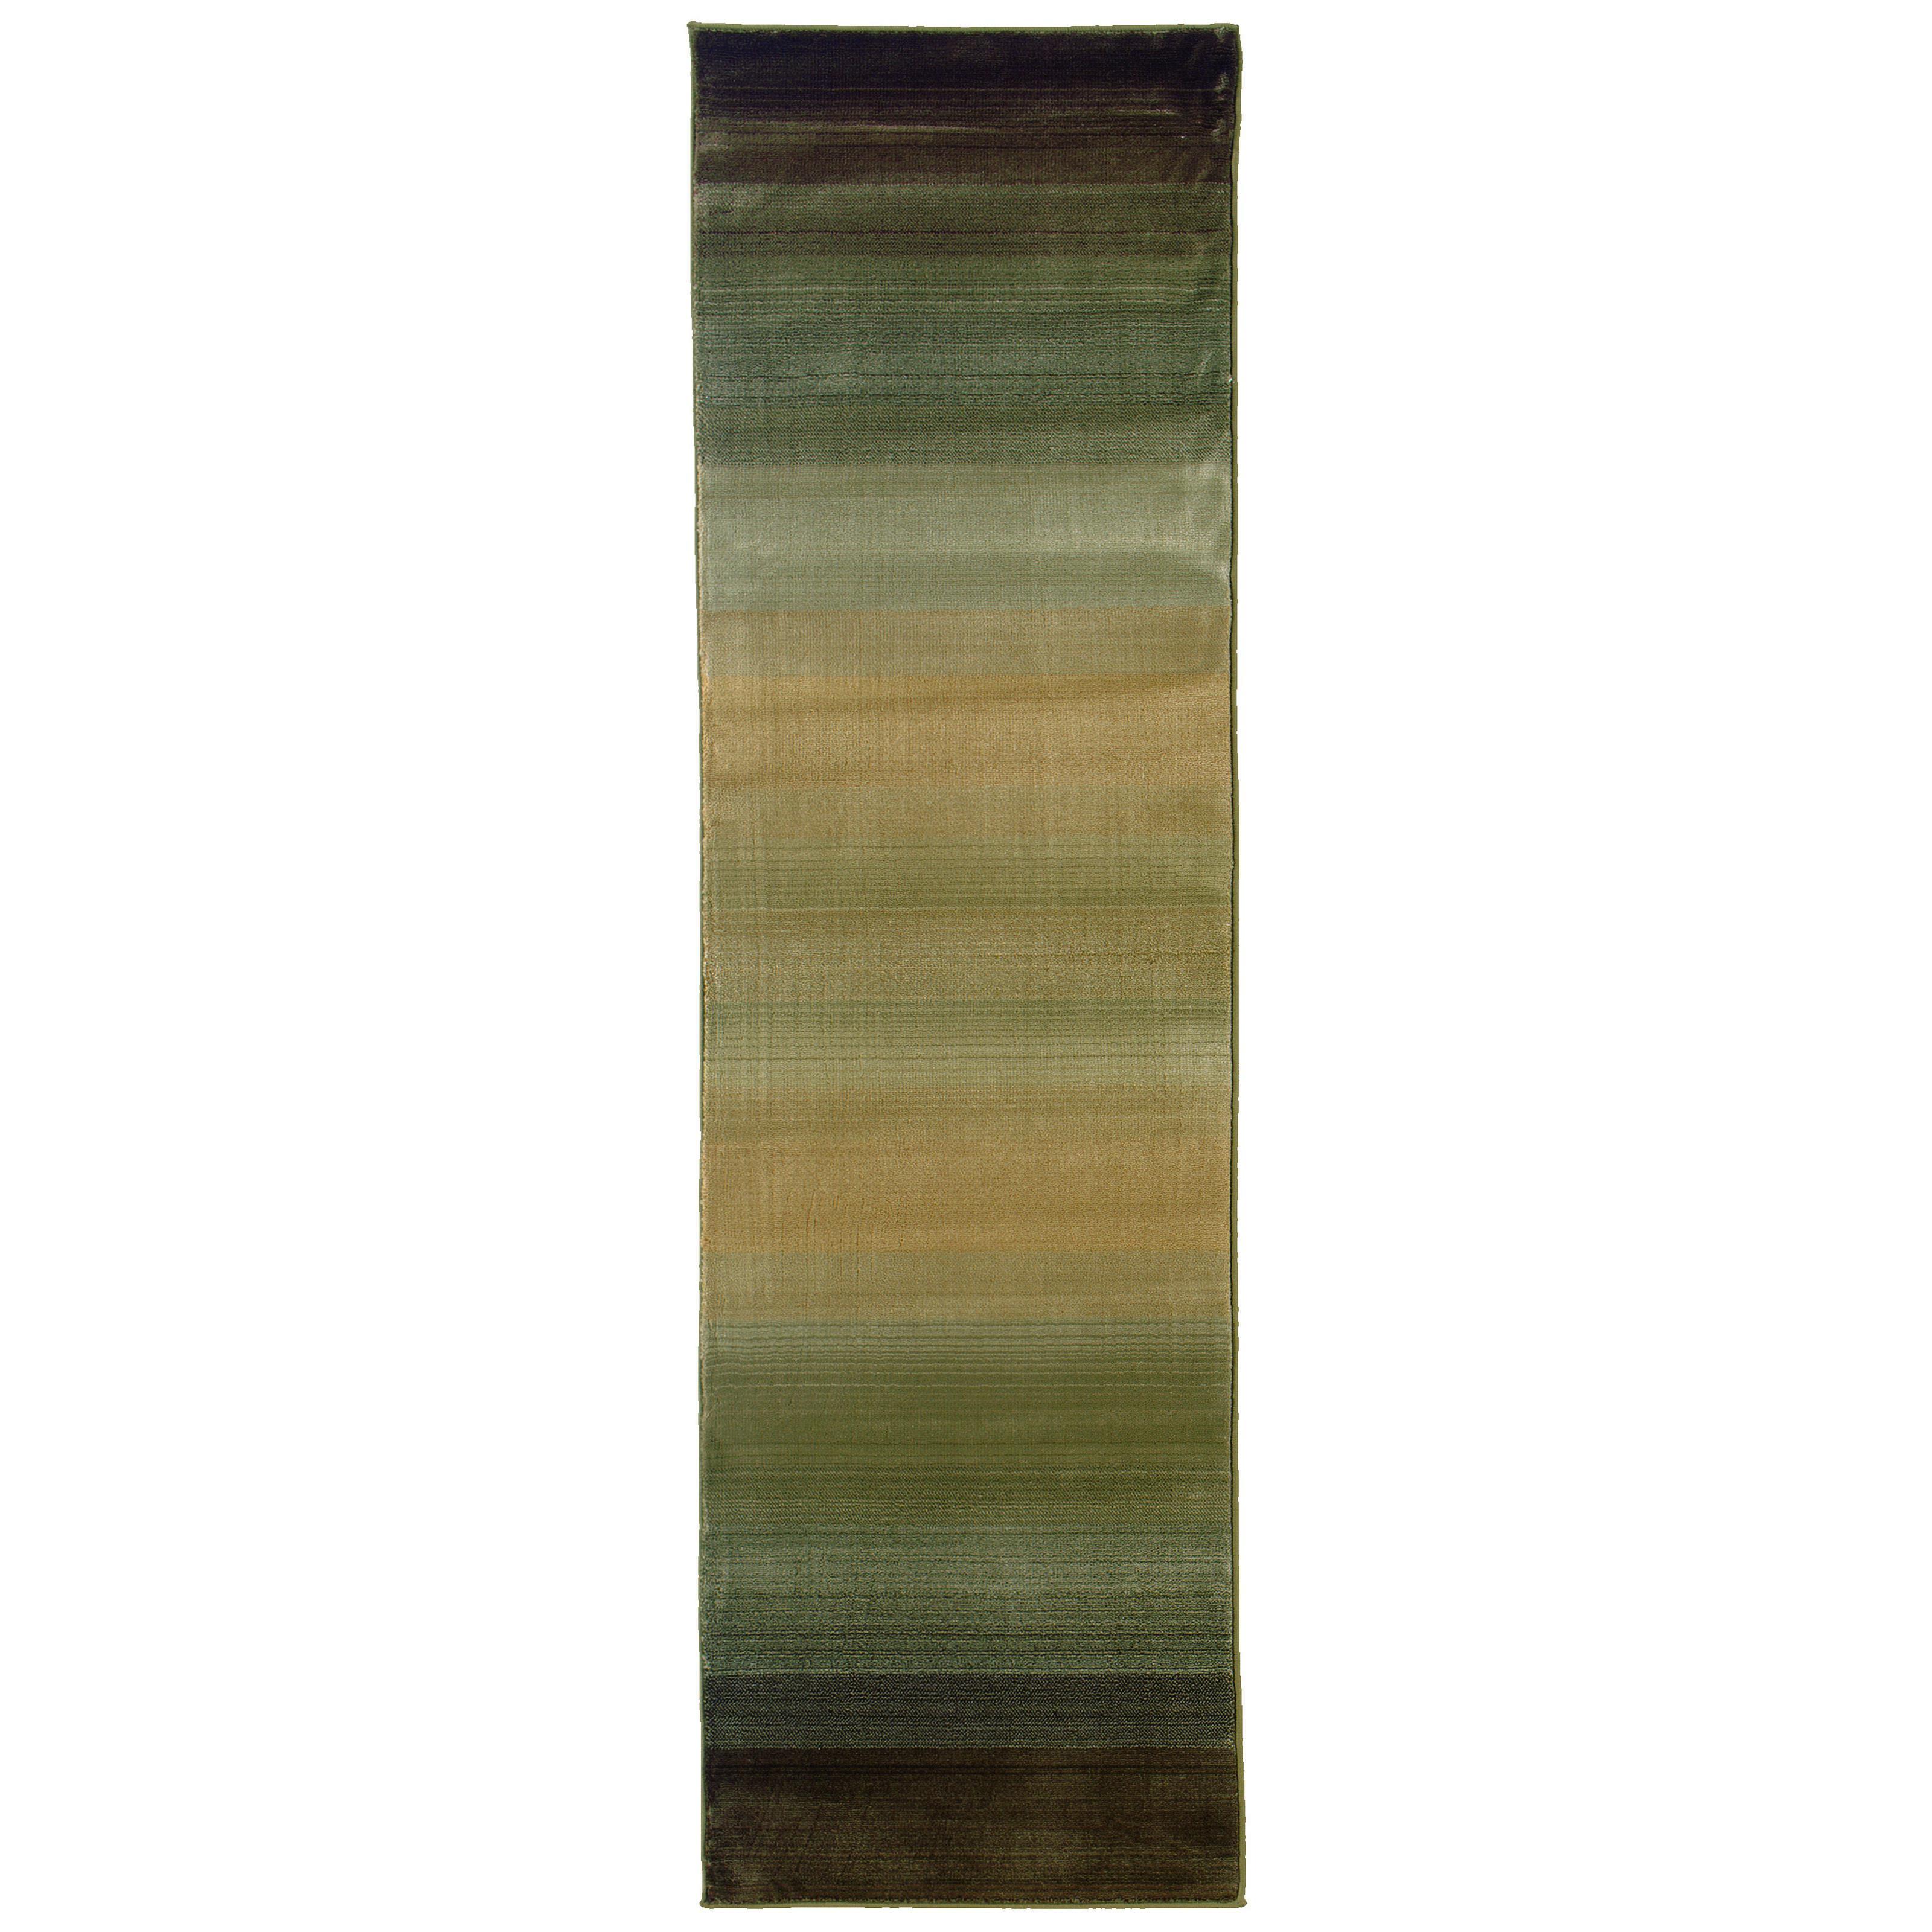 "Oriental Weavers Generations 2' 3"" X  7' 6"" Rug - Item Number: G594X1068235ST"